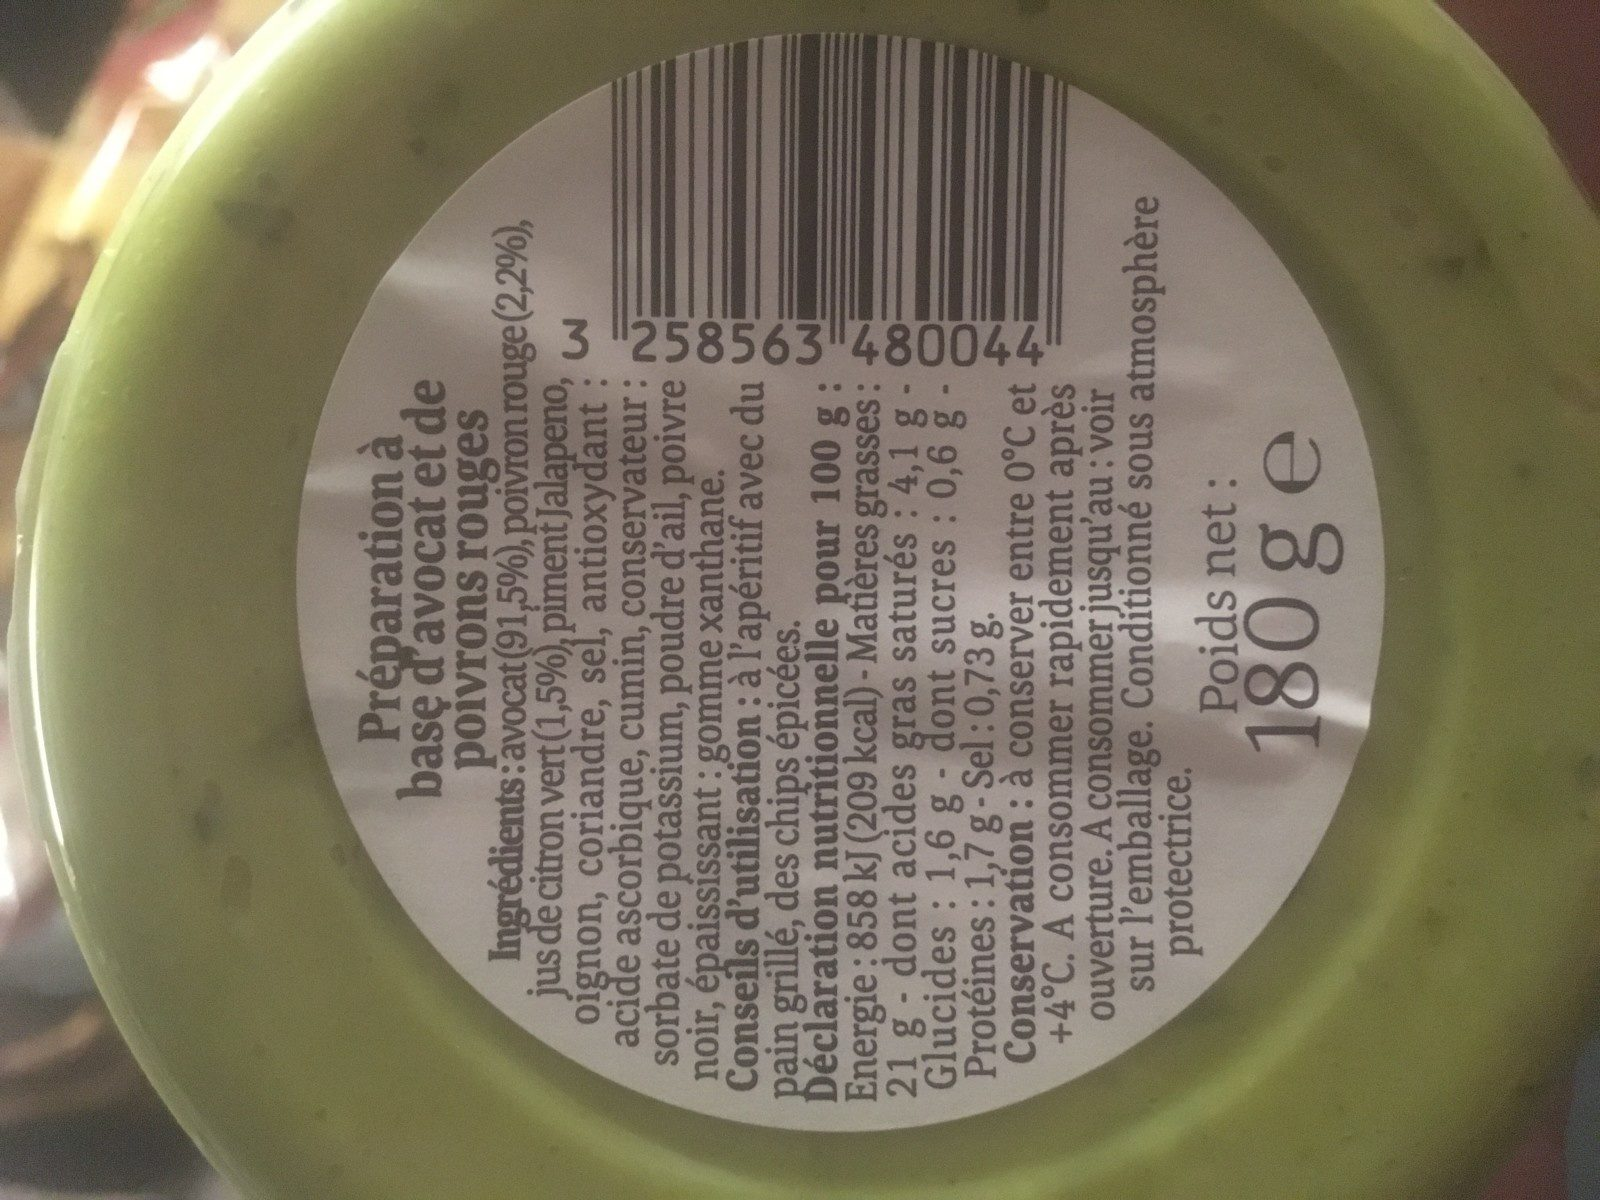 Guacamole premium - Ingredients - fr